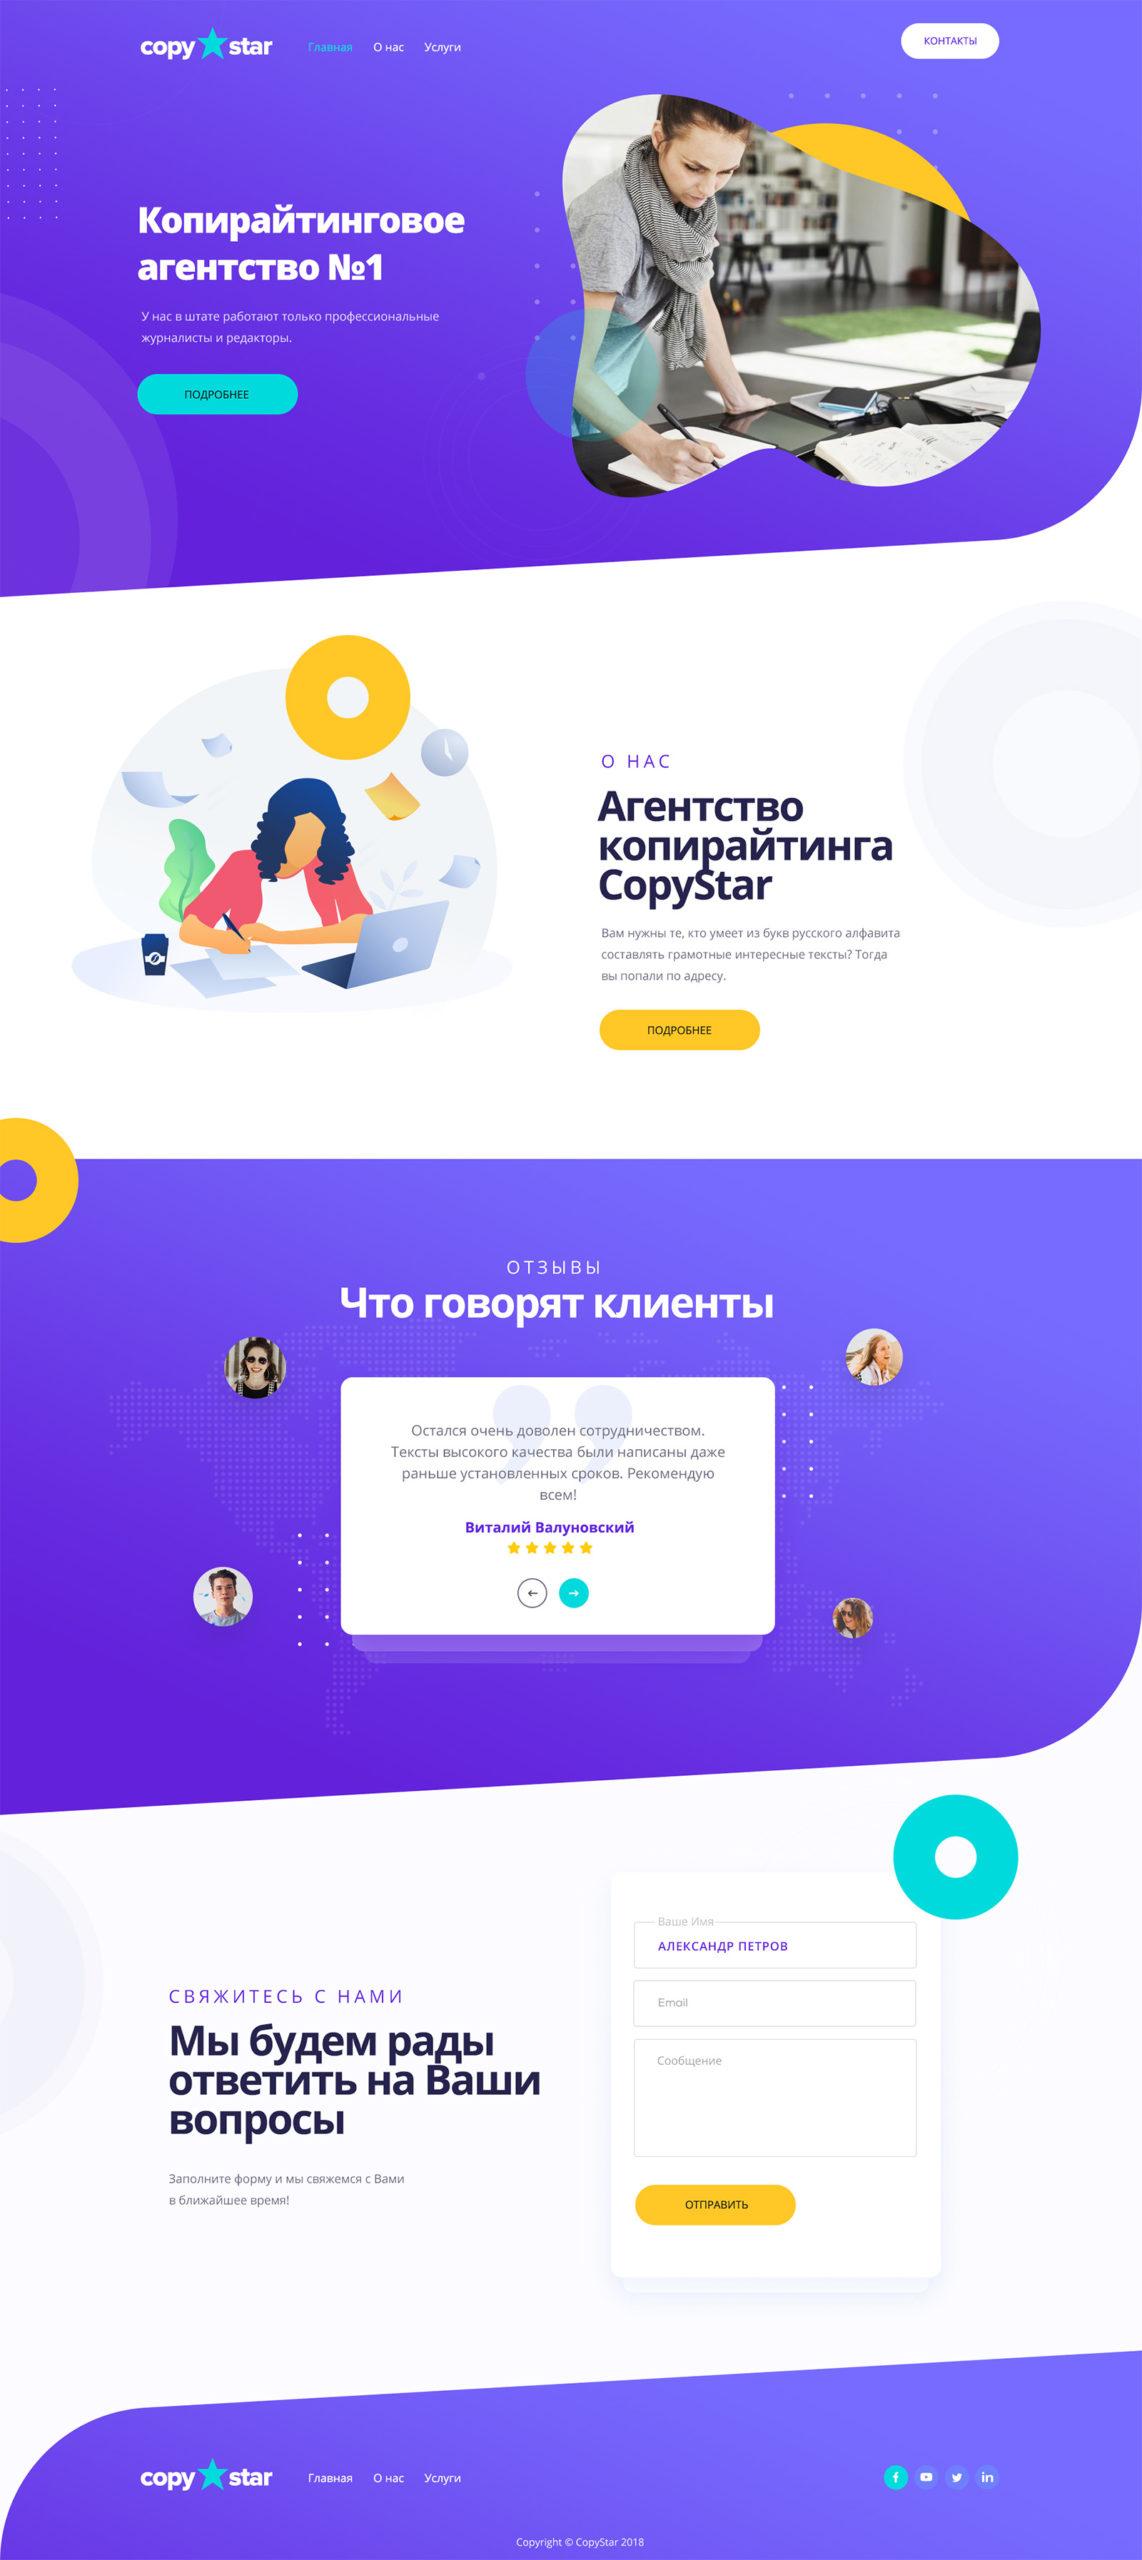 https://28-digital.ru/project/copystar/